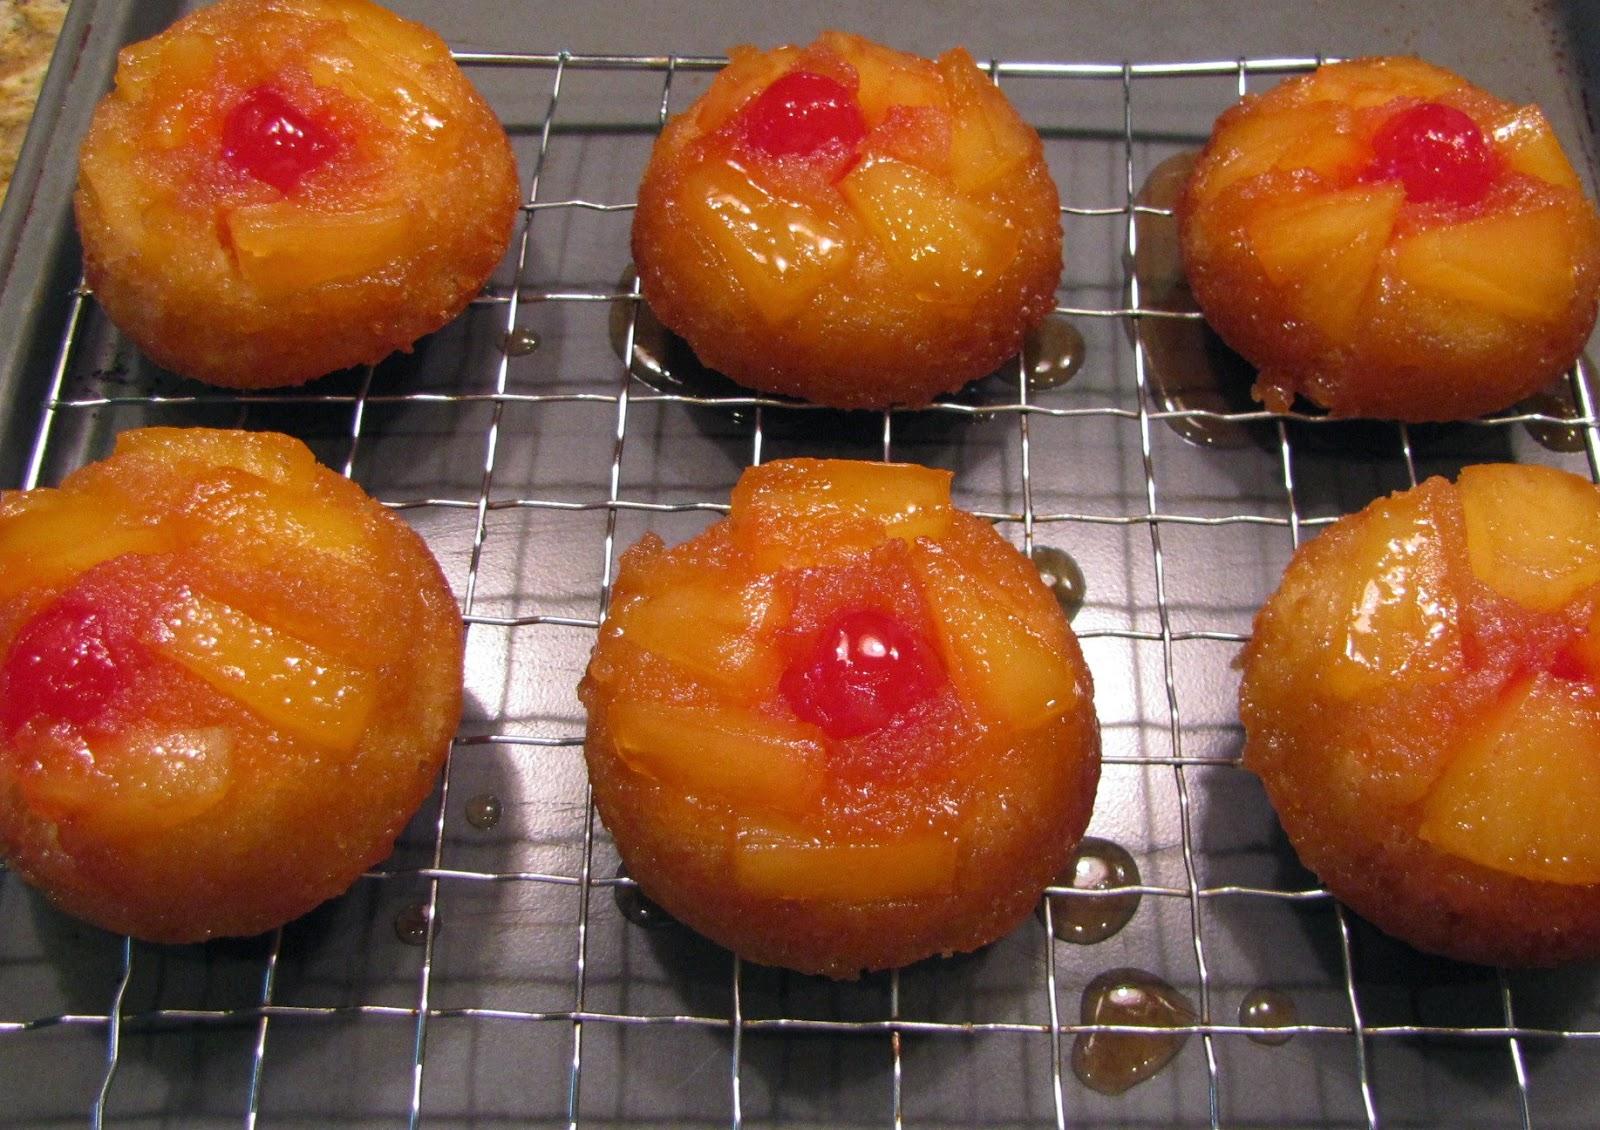 Big Mamas Kitchen Omaha Big Mamas Home Kitchen Mini Pineapple Upside Down Cakes